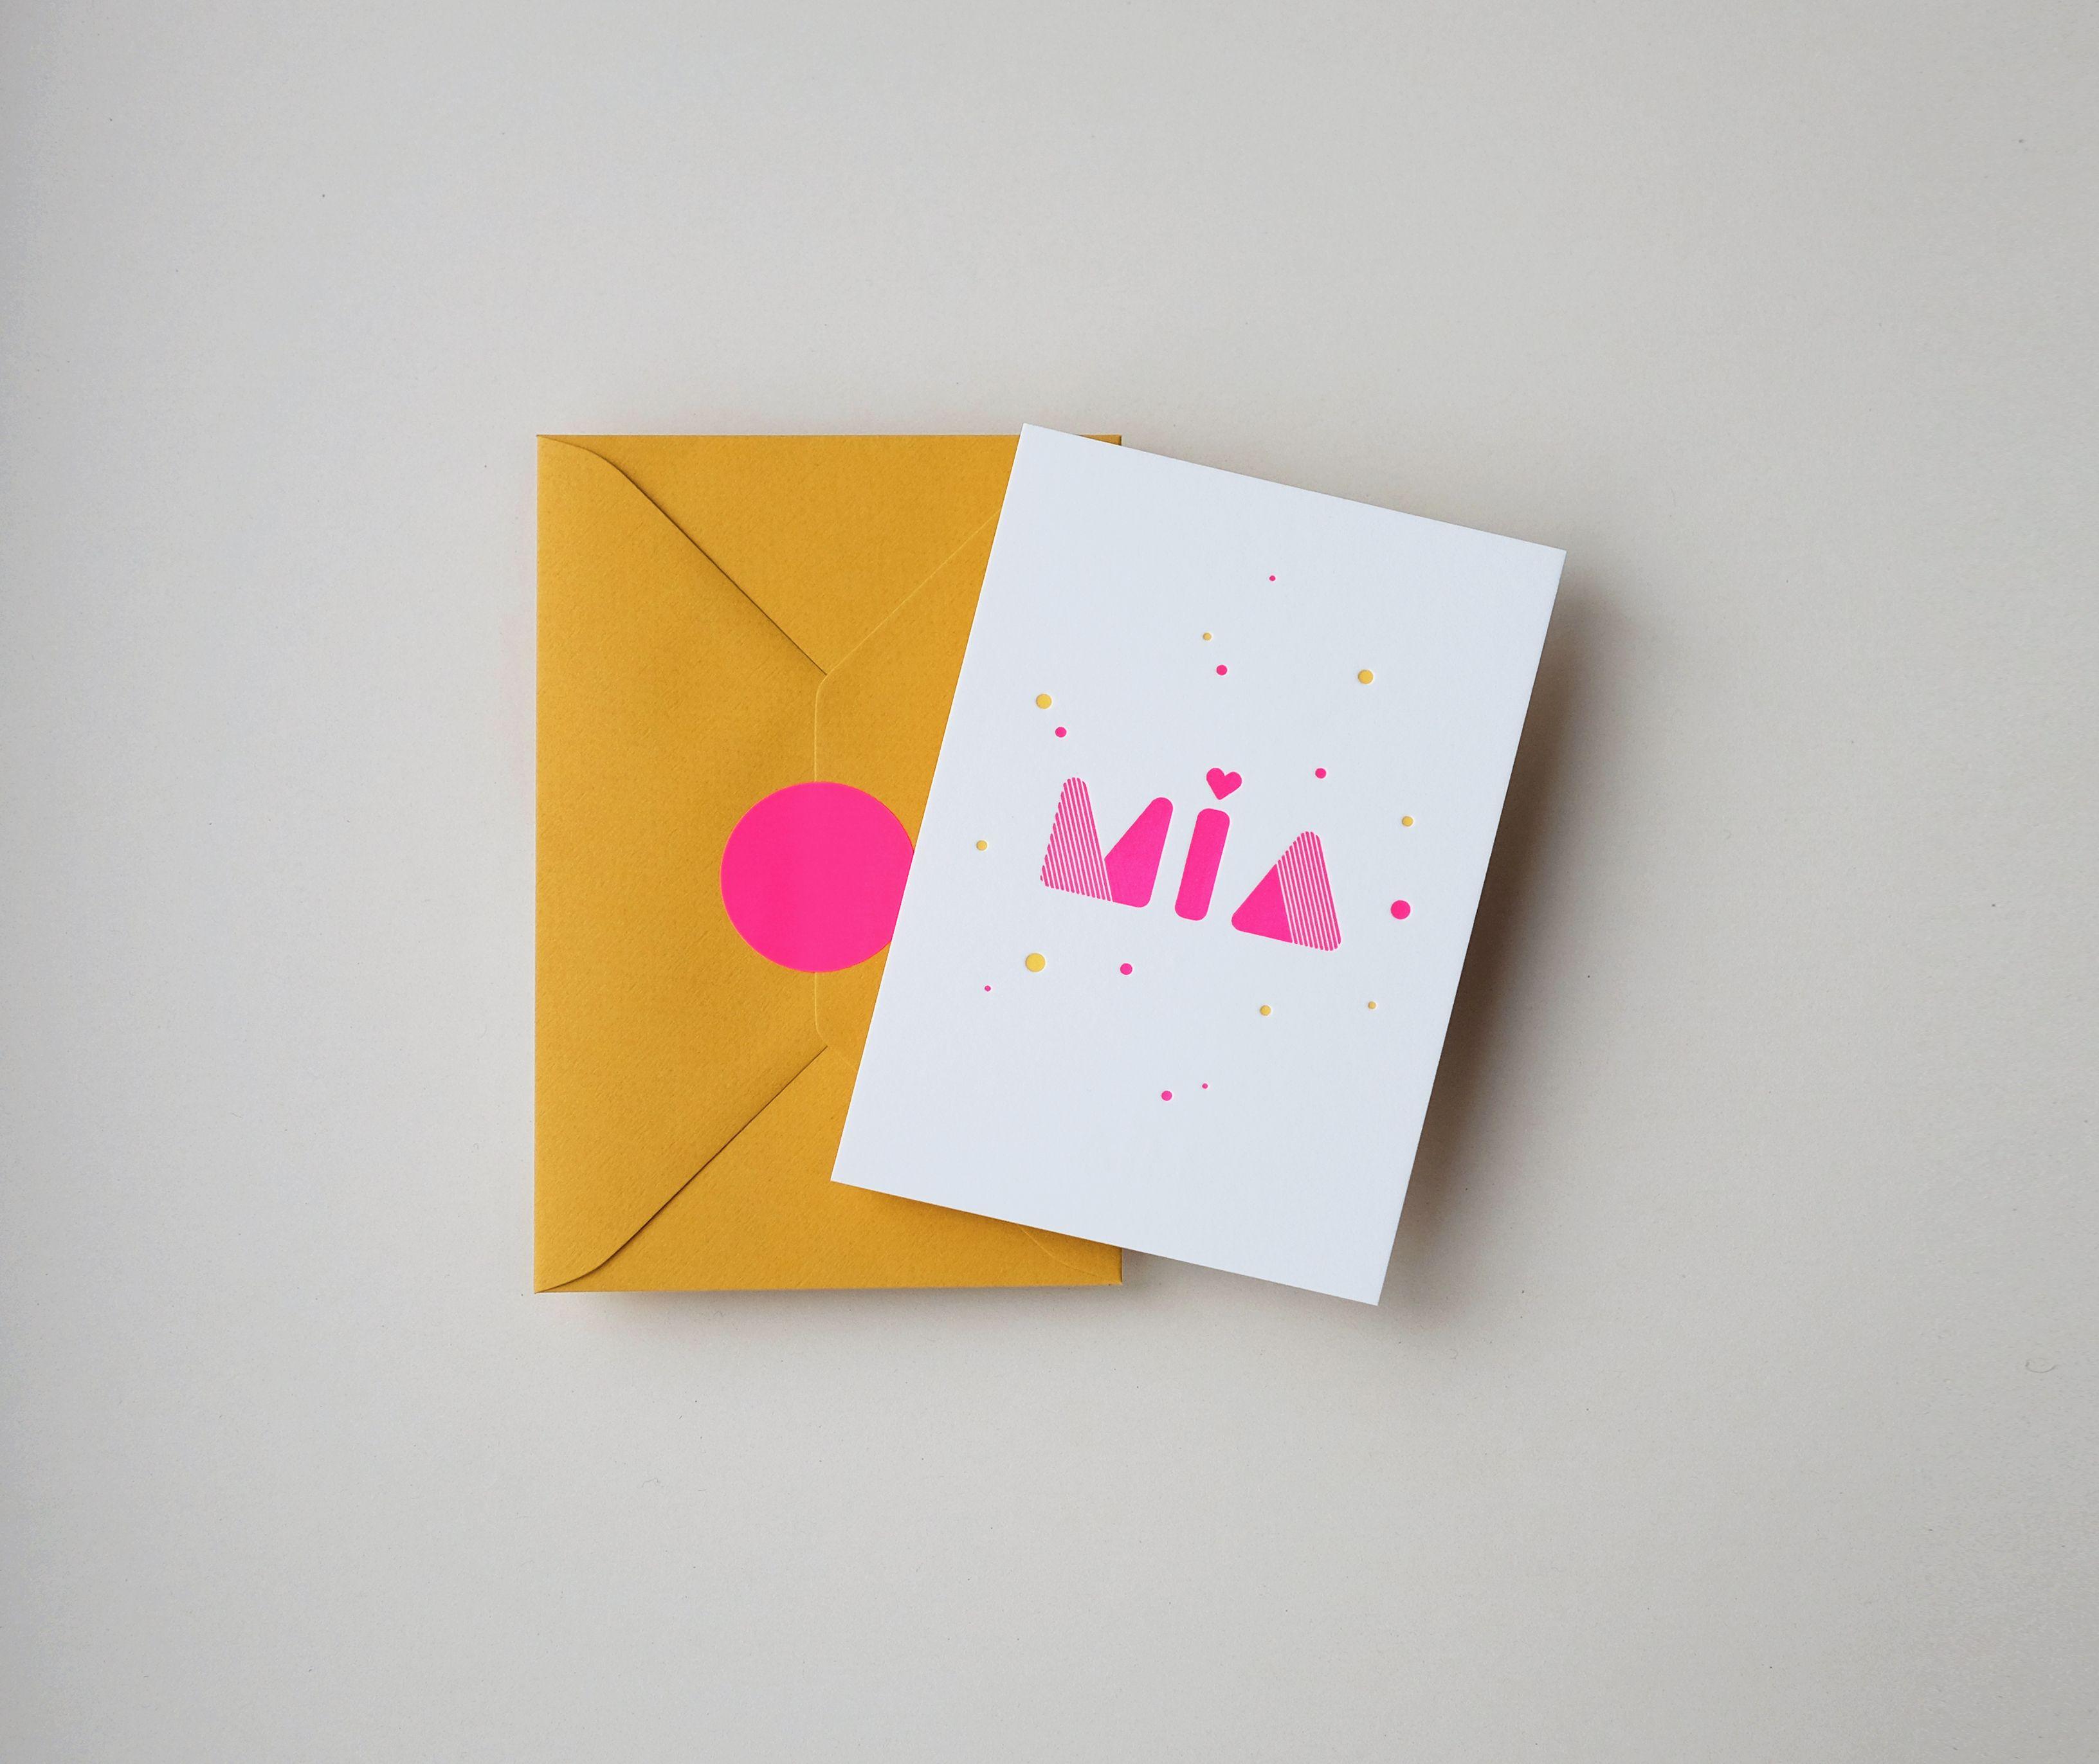 MIA birthannouncement letterpress, popcolor pink and yellow - studio sijm